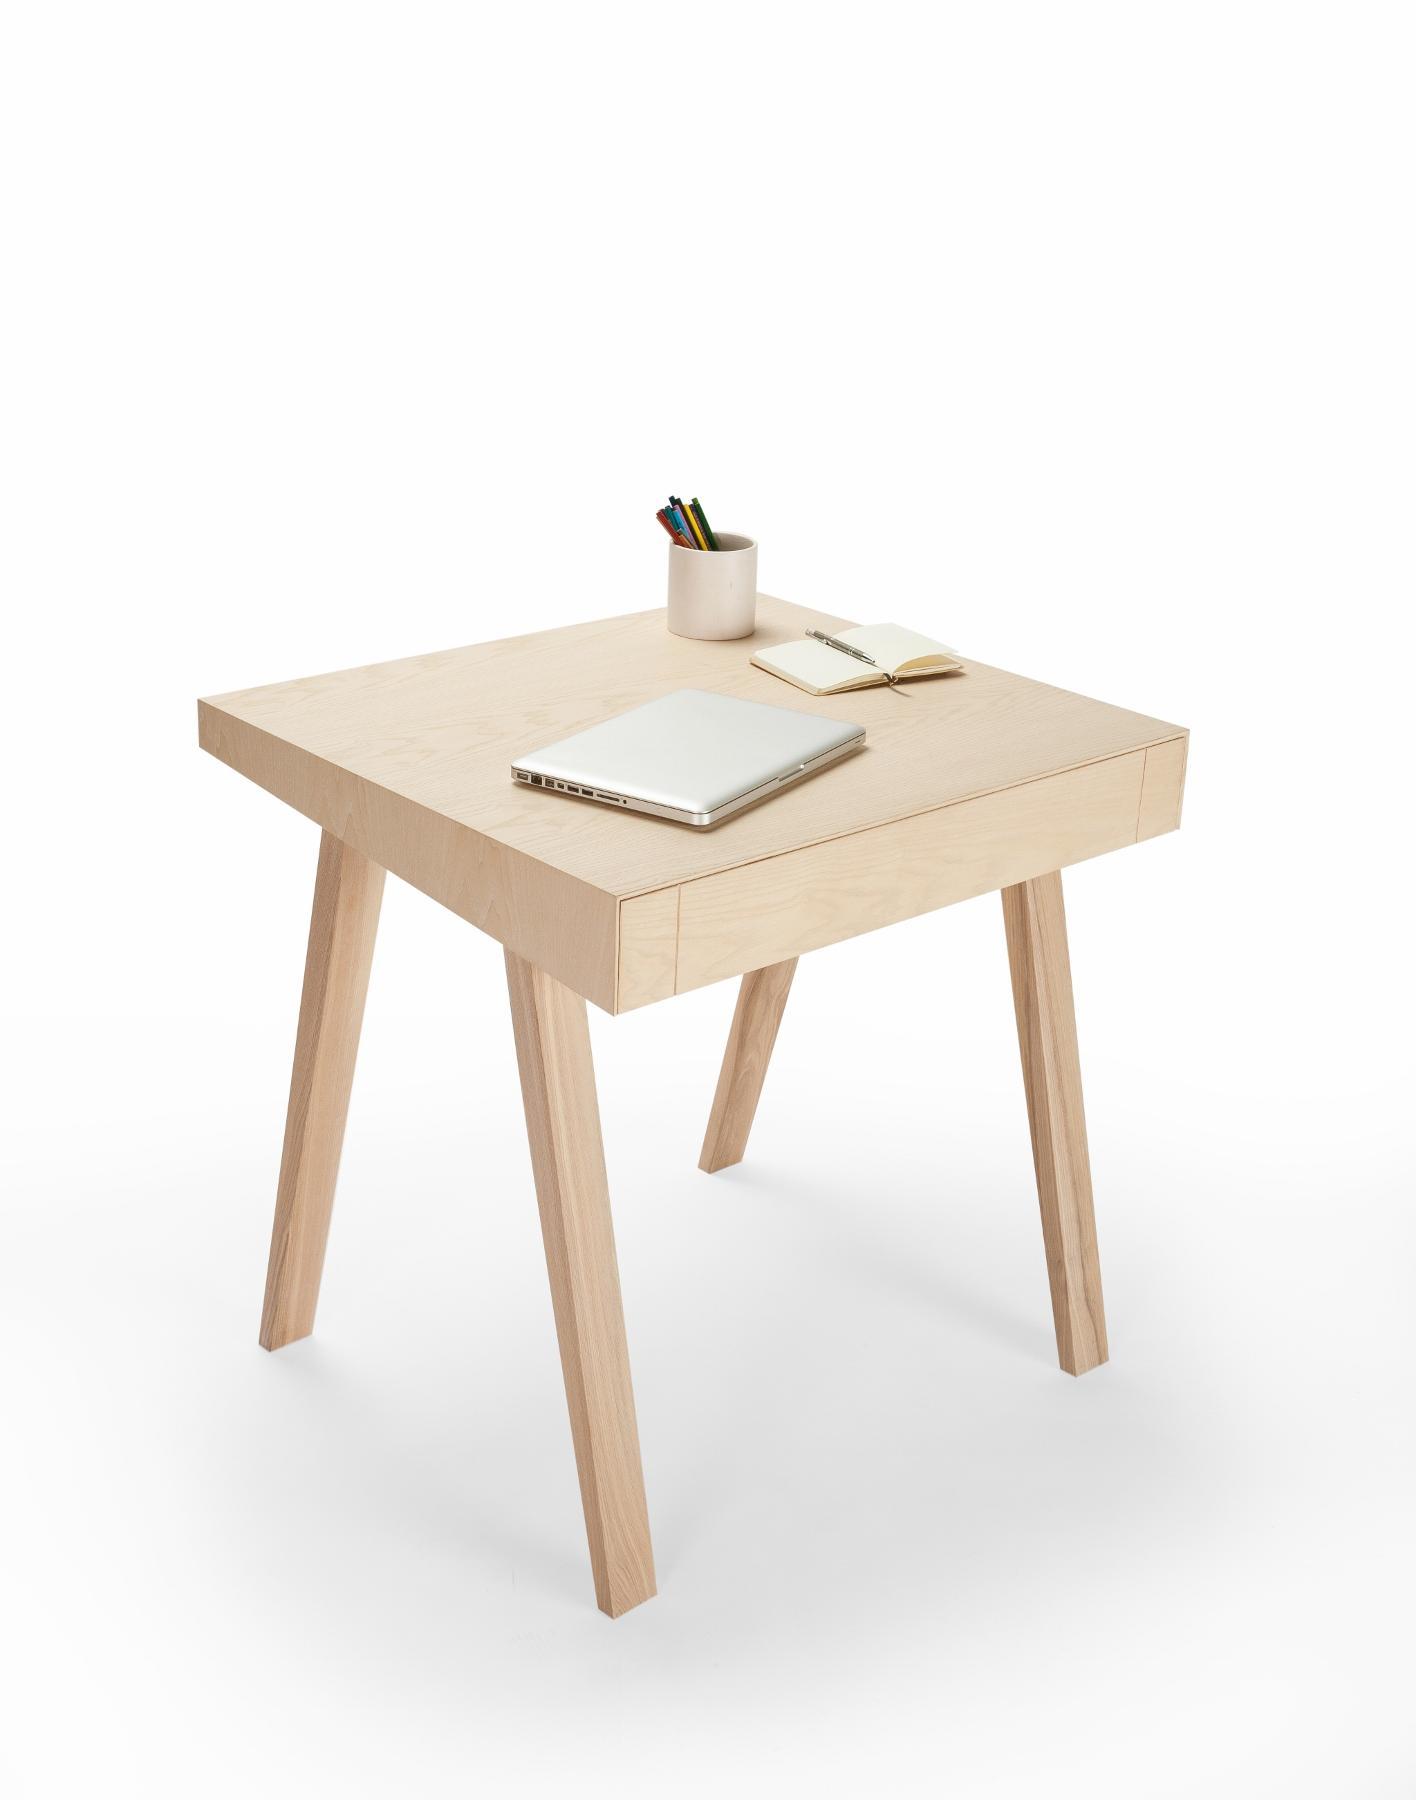 innovativer designer b rotisch 4 9 aus massivholz emko. Black Bedroom Furniture Sets. Home Design Ideas